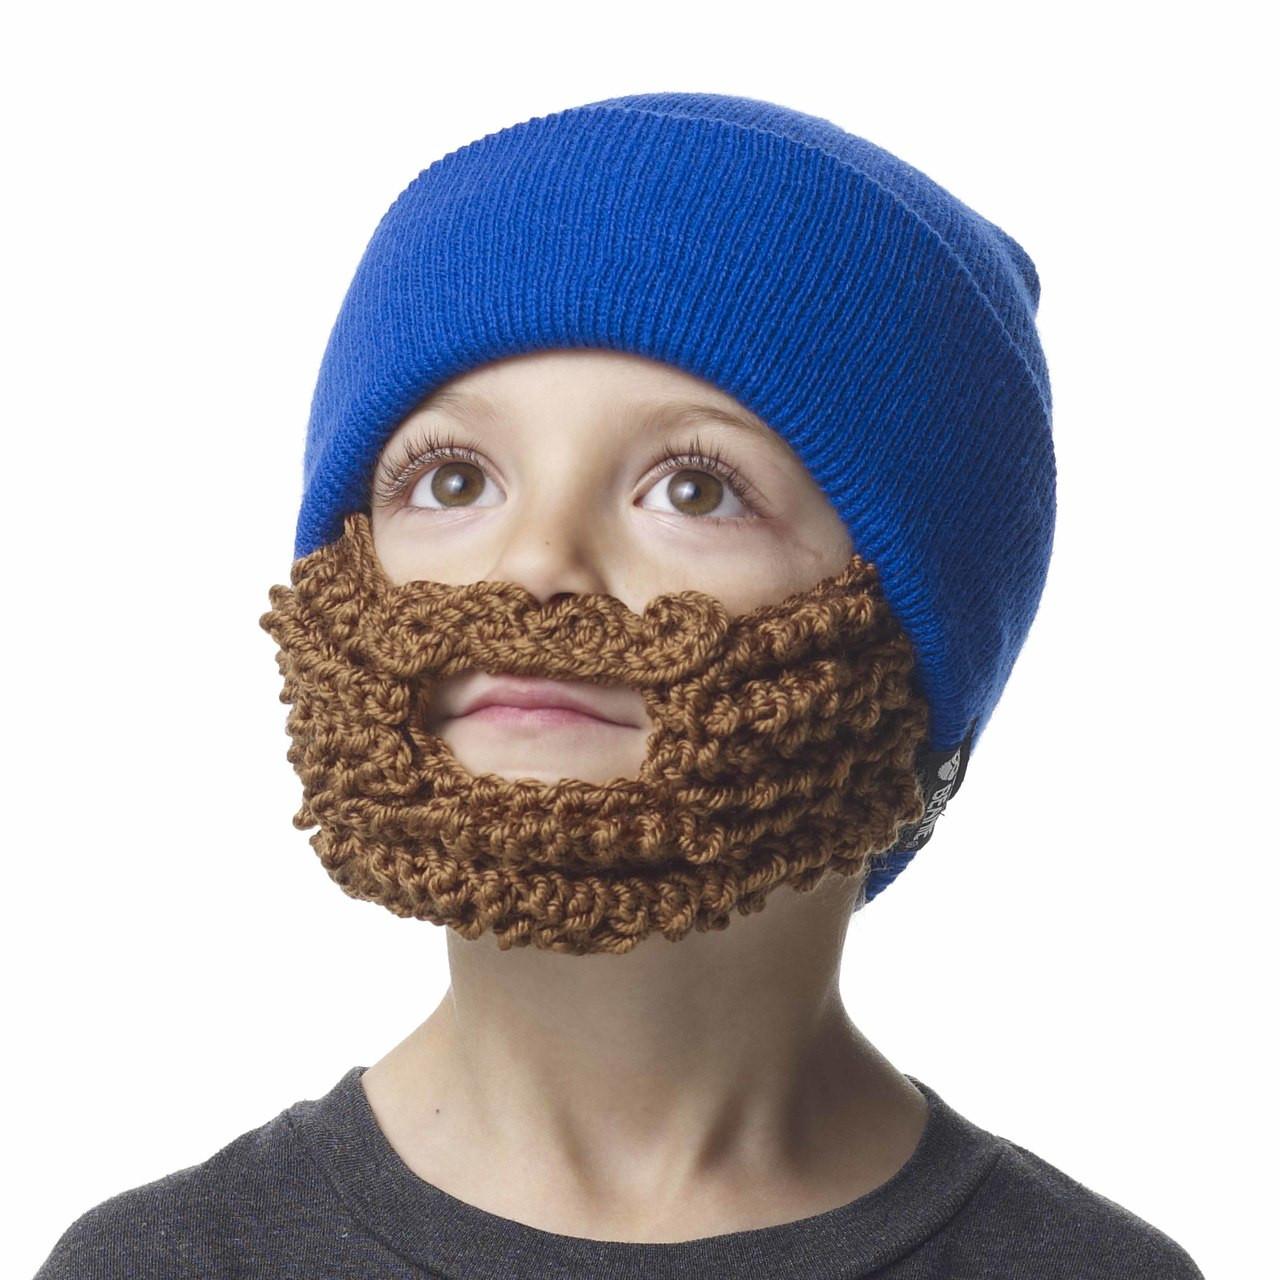 3dc044a498d The Original Beard Beanie™ Little Man Lumberjack - The Authentic ...